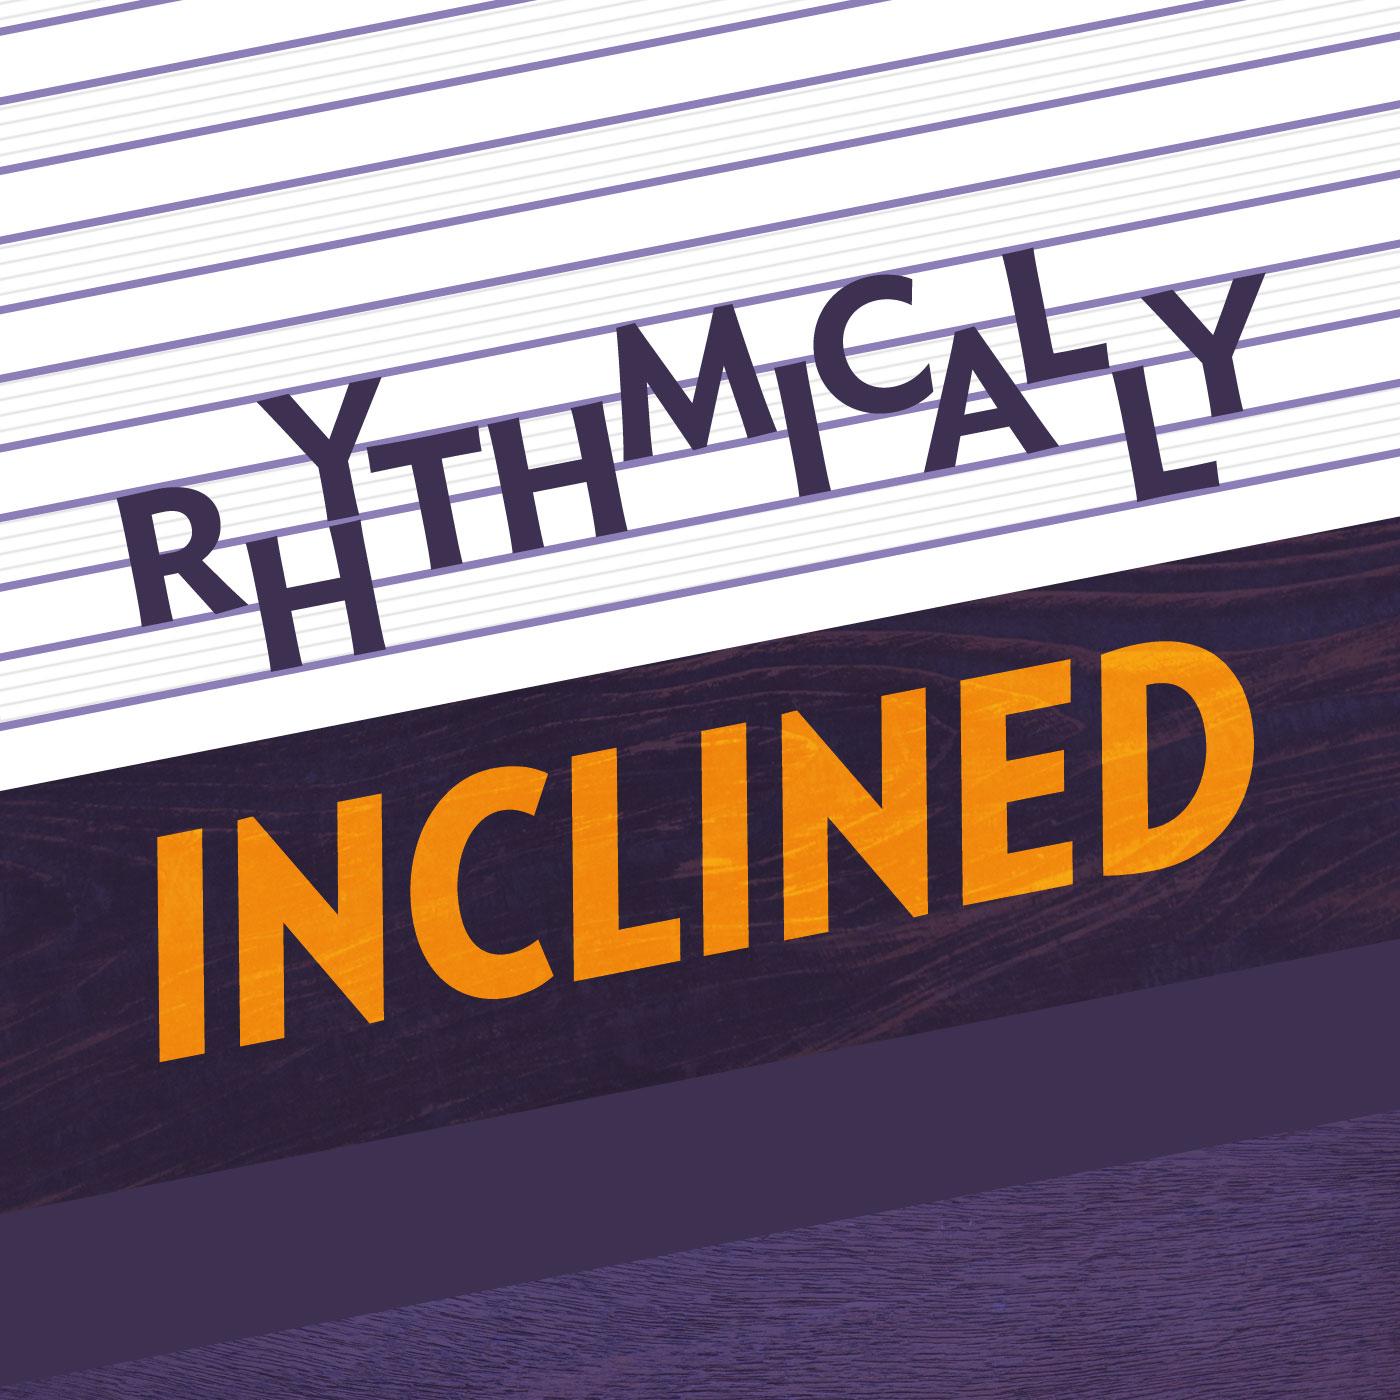 Rhythmically Inclined